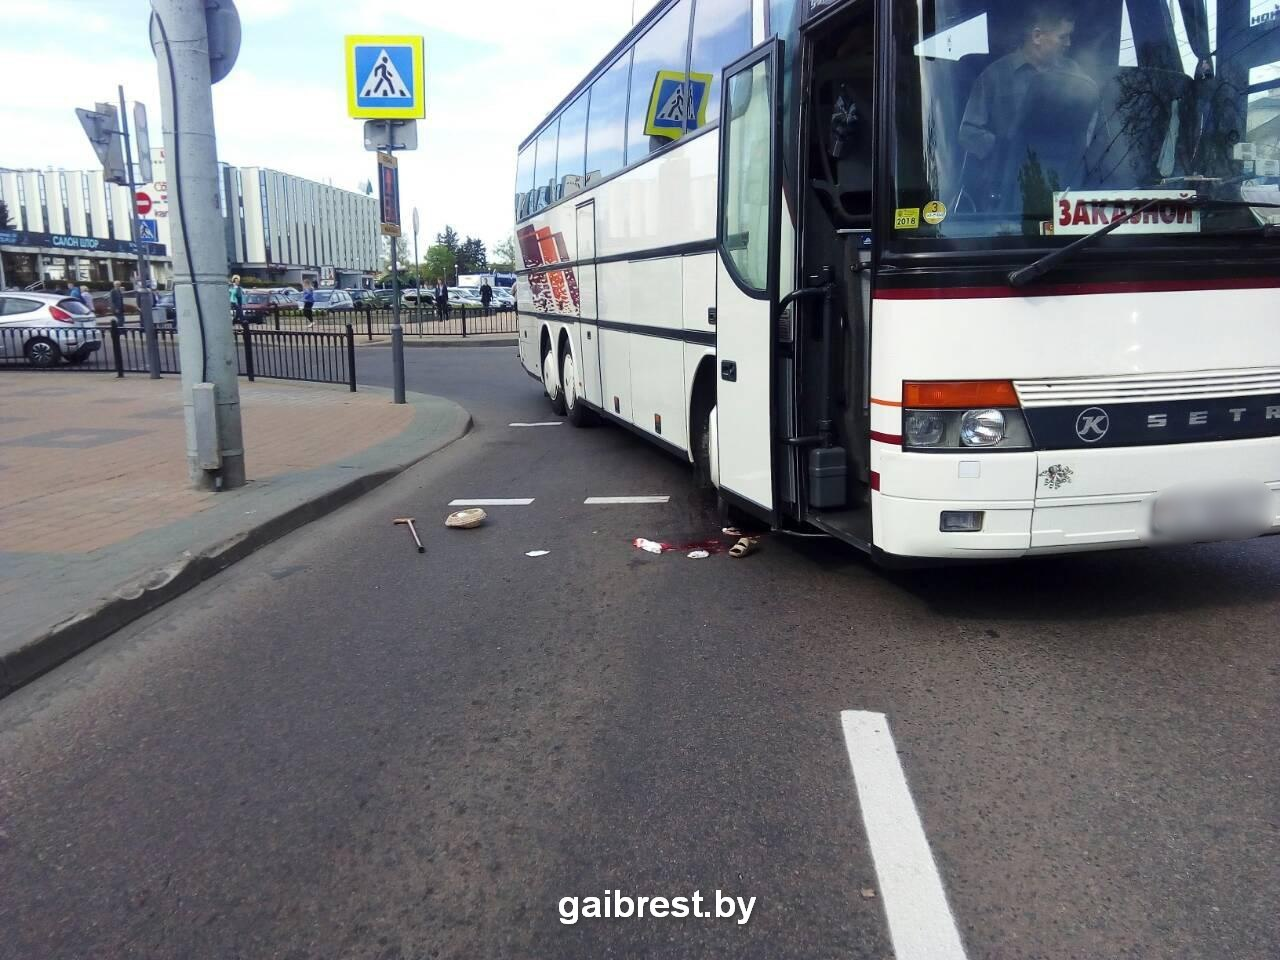 На пешеходном переходе тяжело травмирована пенсионерка